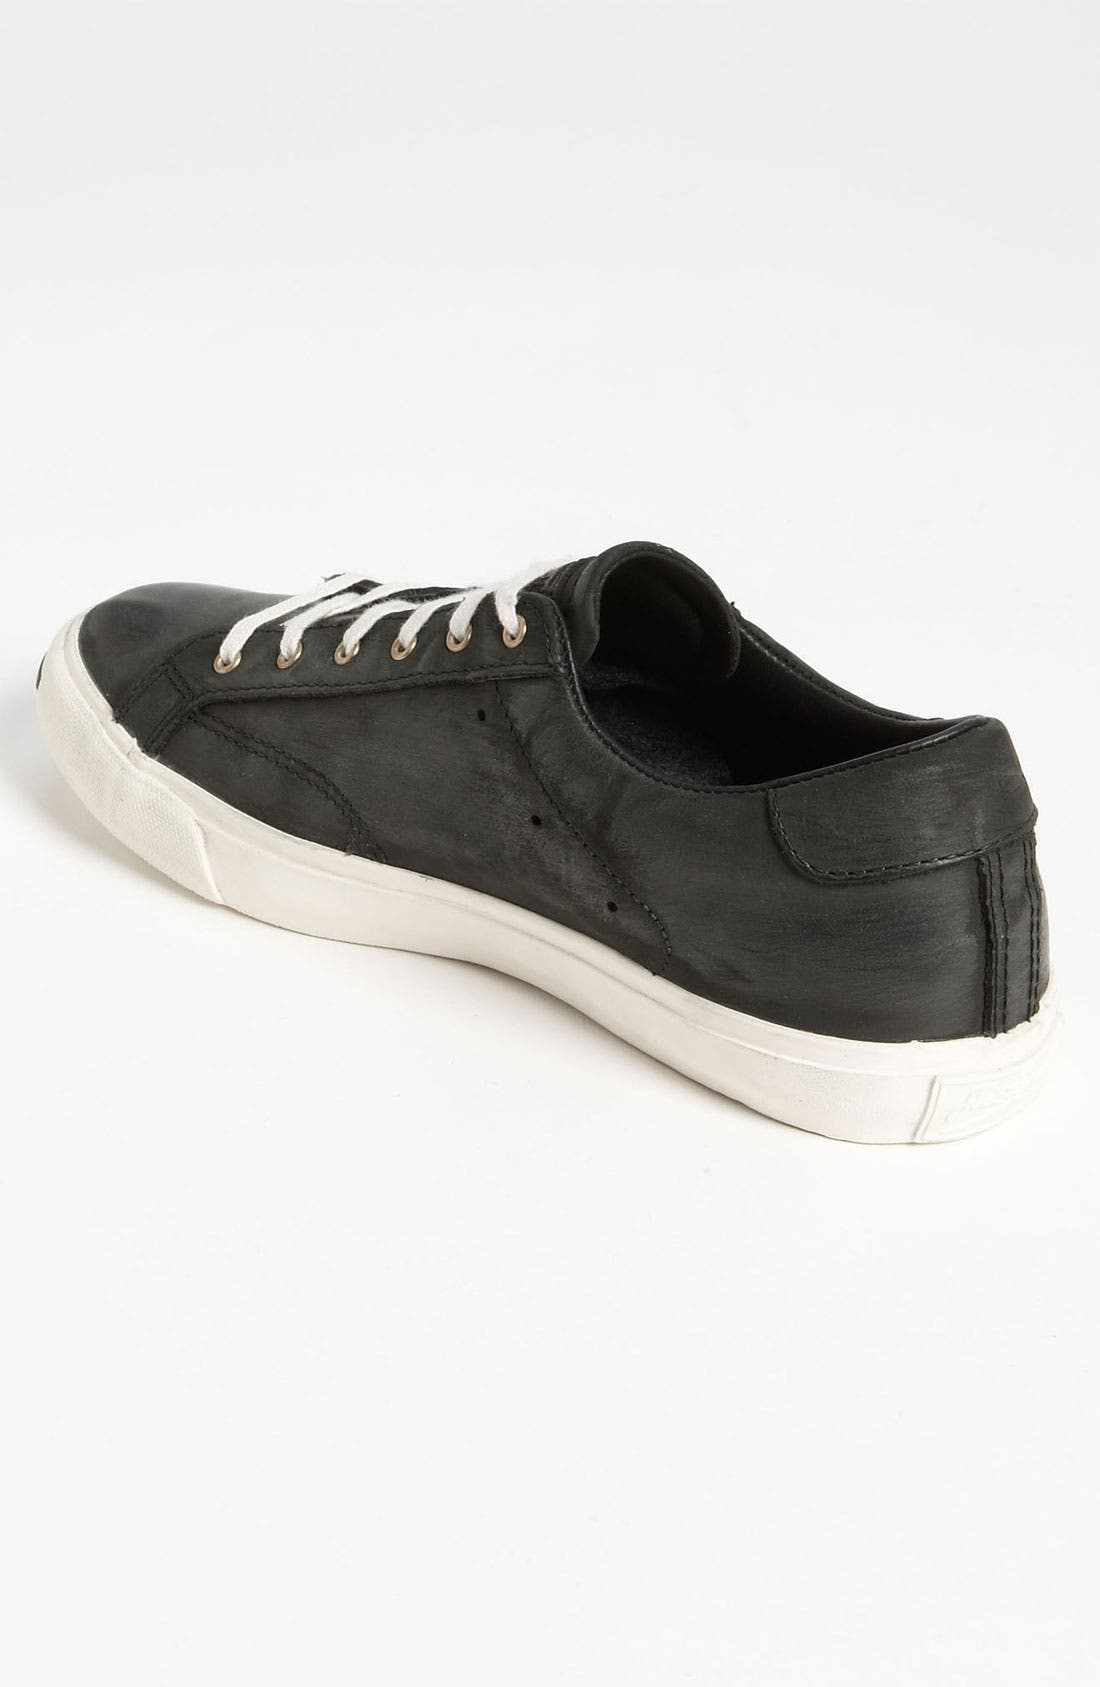 Alternate Image 2  - Converse 'Jack Purcell - Peter' Sneaker (Unisex)